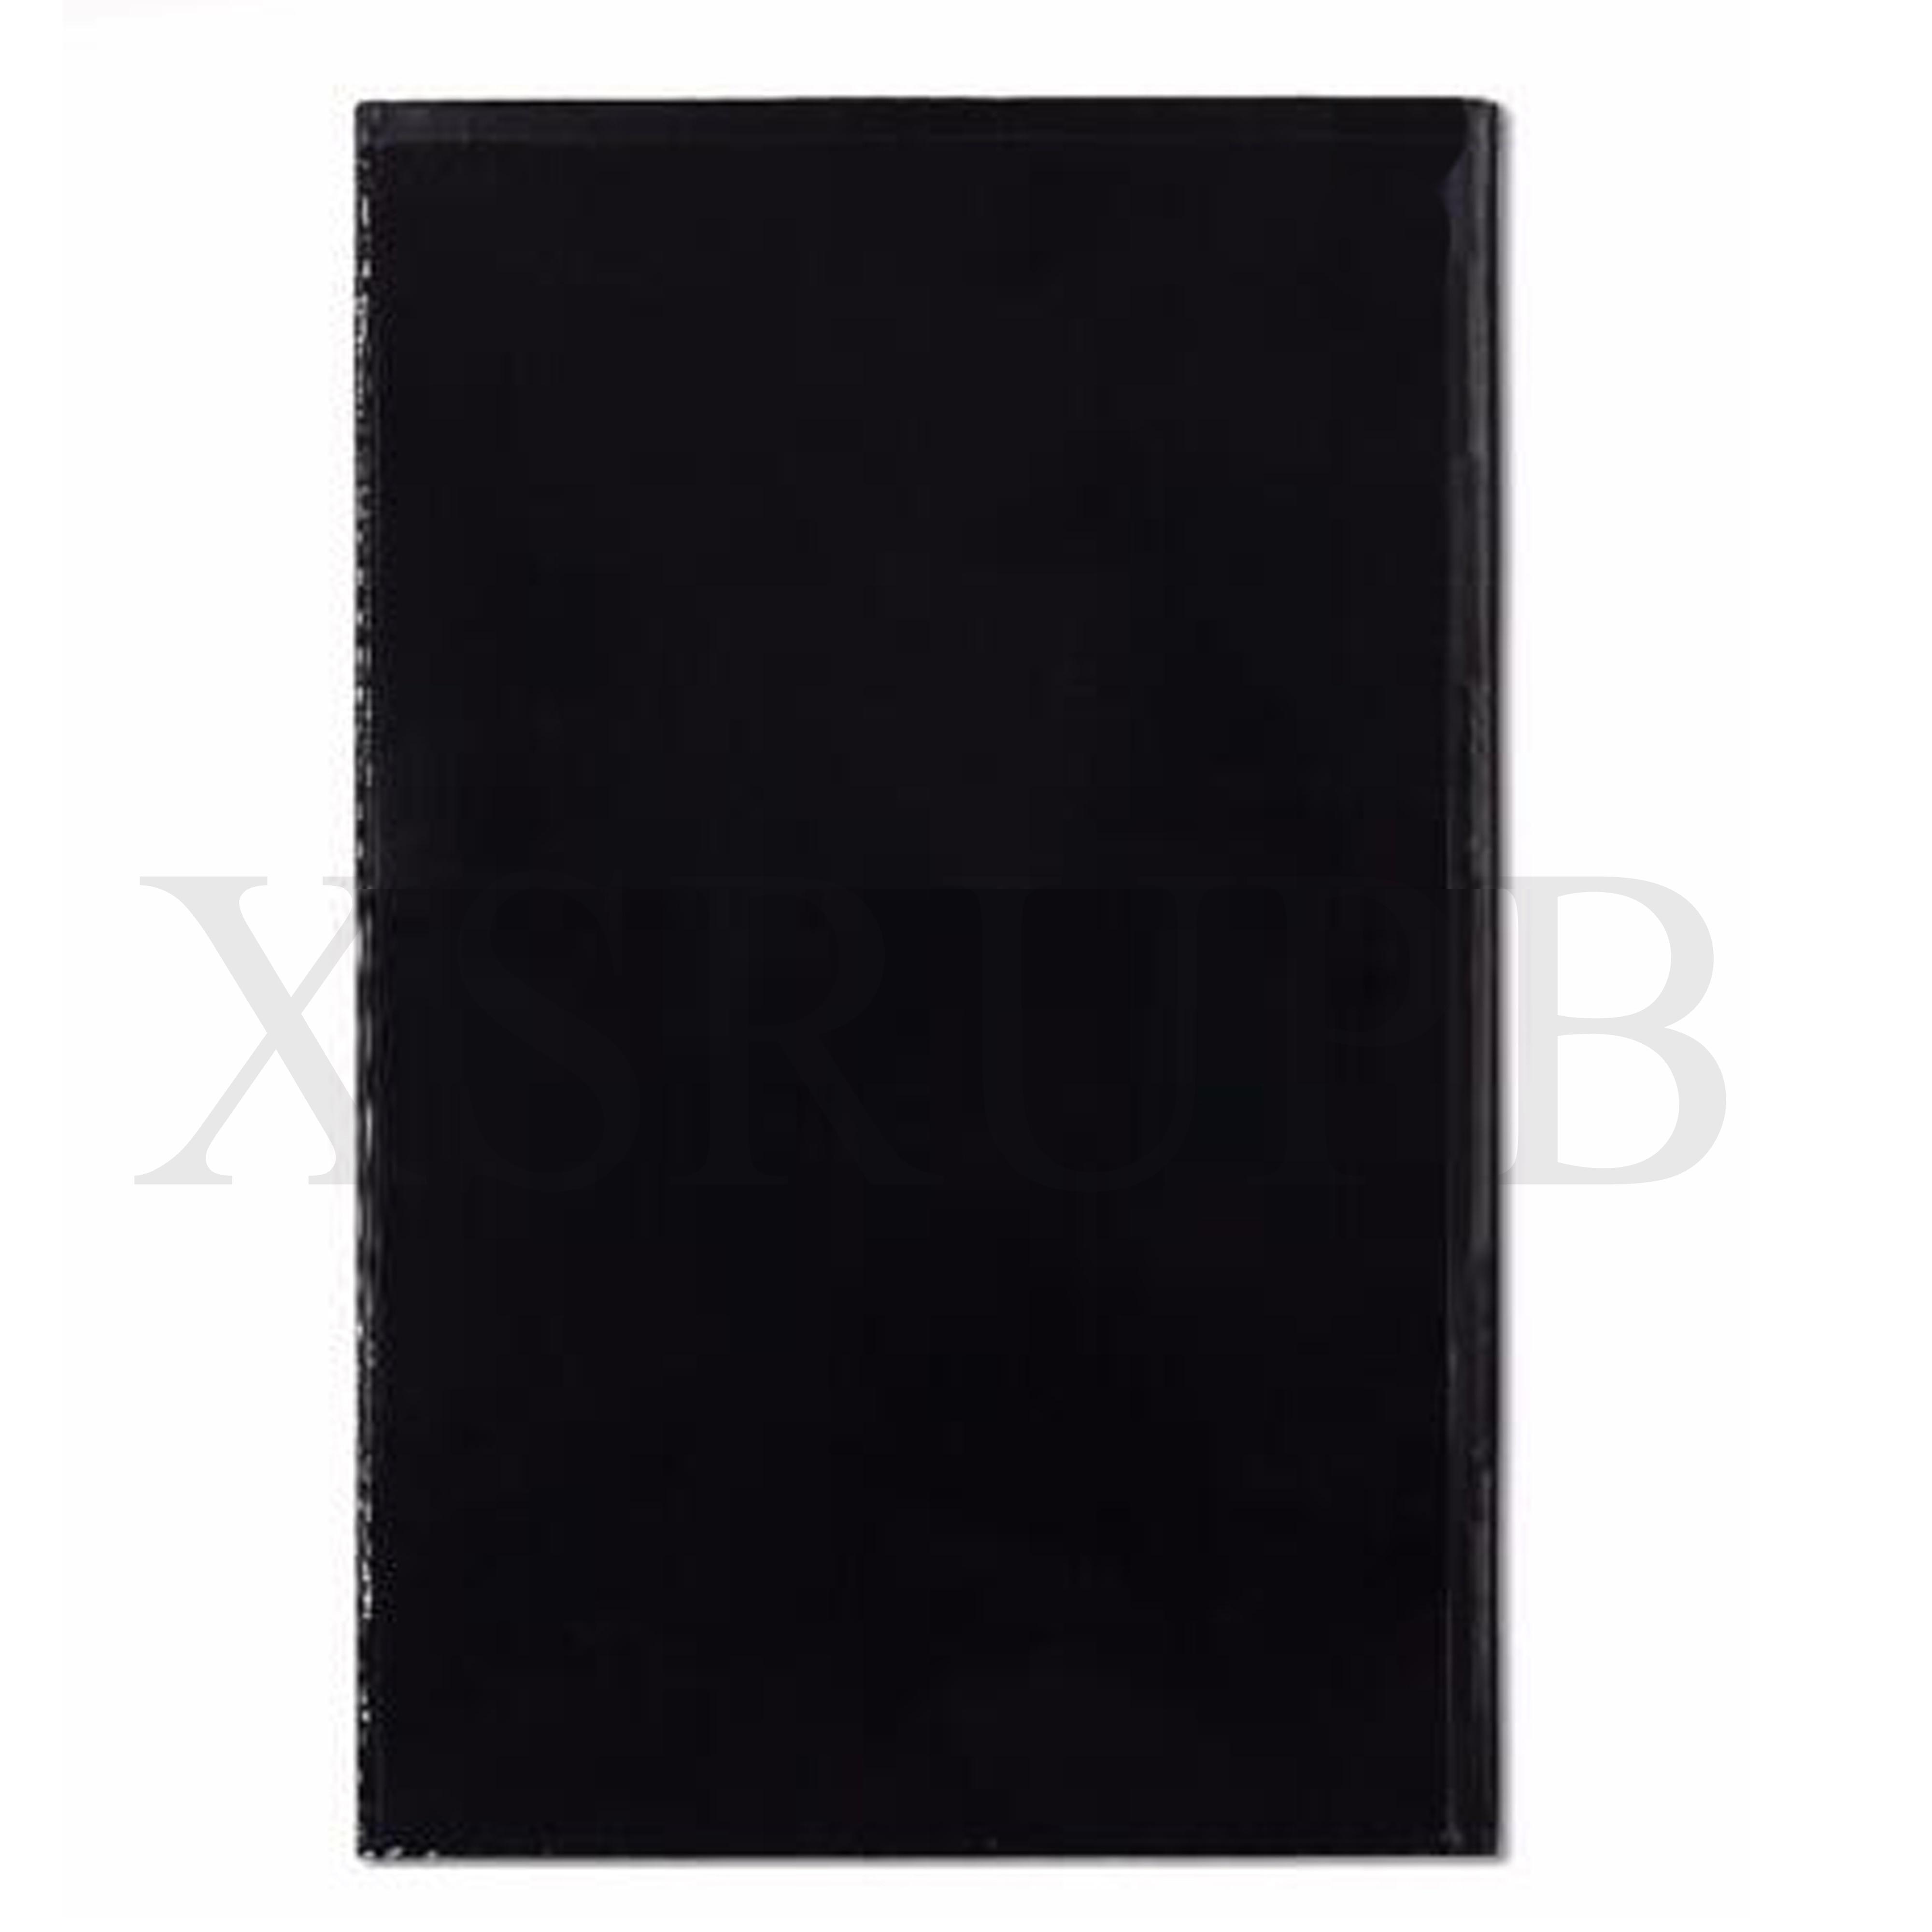 34PIN New Lcd Display For Alcatel Tab 1T 8068 8067 7.0